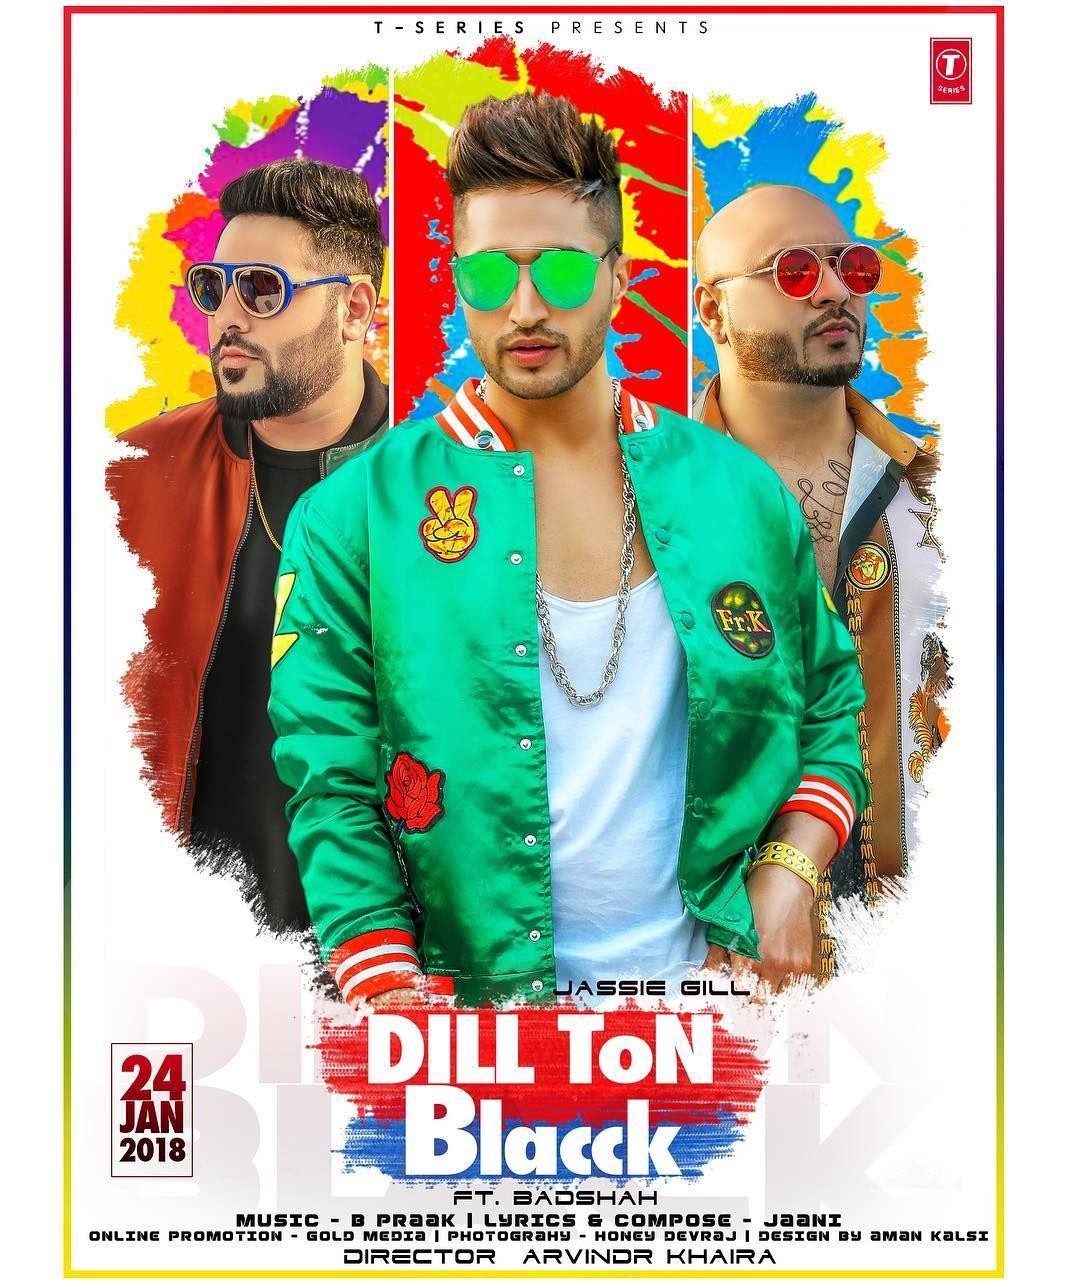 Dill Ton Blacck 24thjan Special Featuring Badboyshah Bhaji Music Bpraak Lyrics Jaani777 Video Arvindrkhaira Mp3 Song Download Mp3 Song Jassi Gill